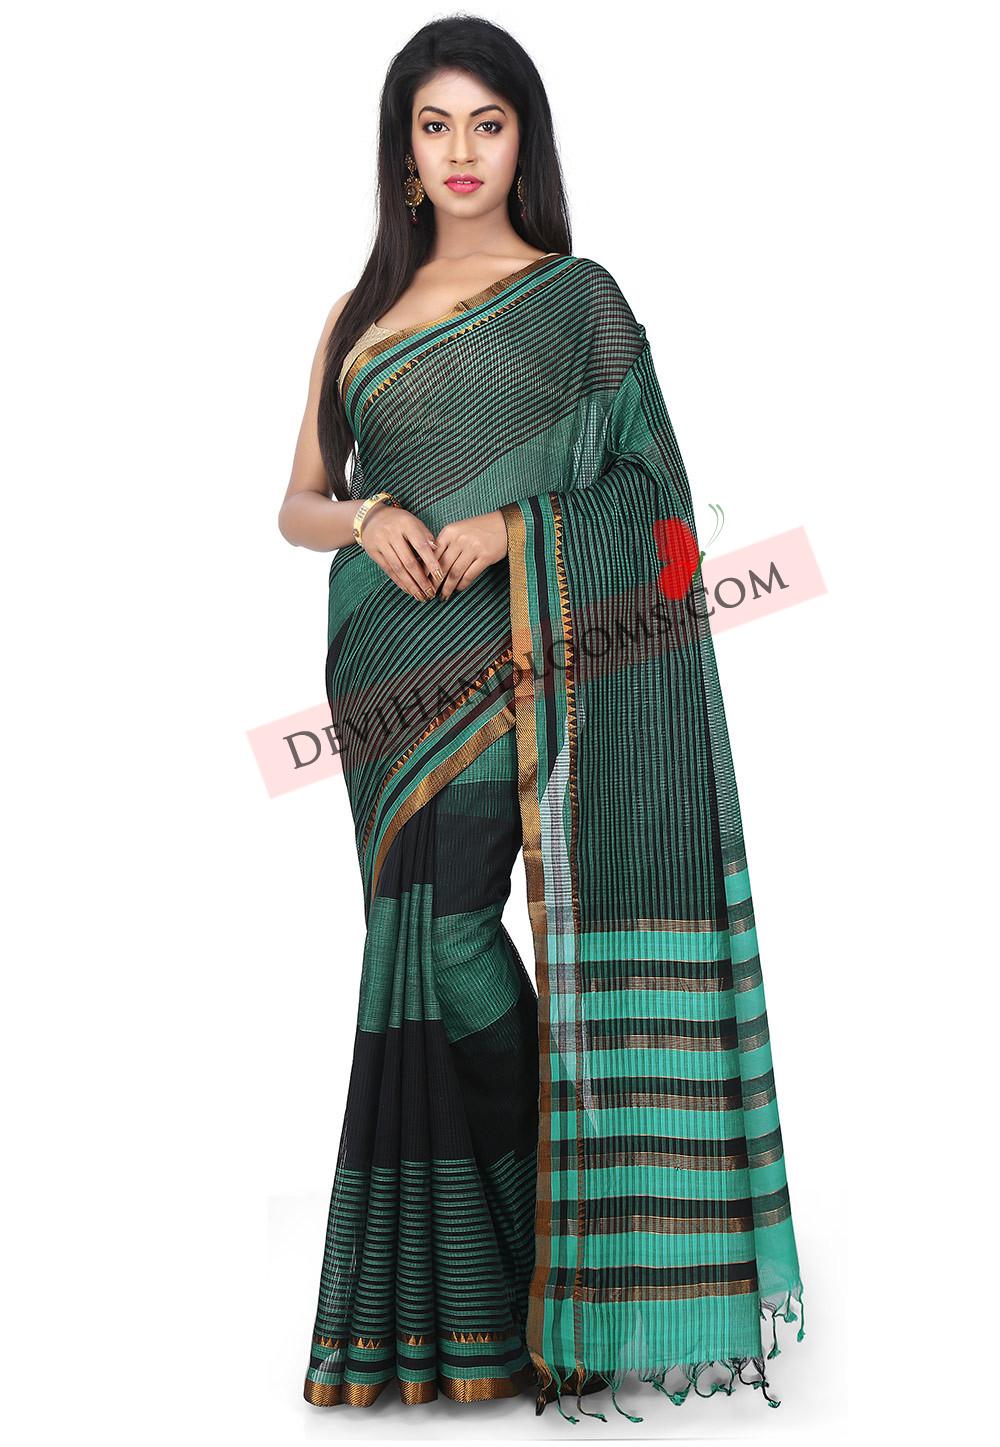 Black with Turquoise Mangalagiri Handloom Saree (3)